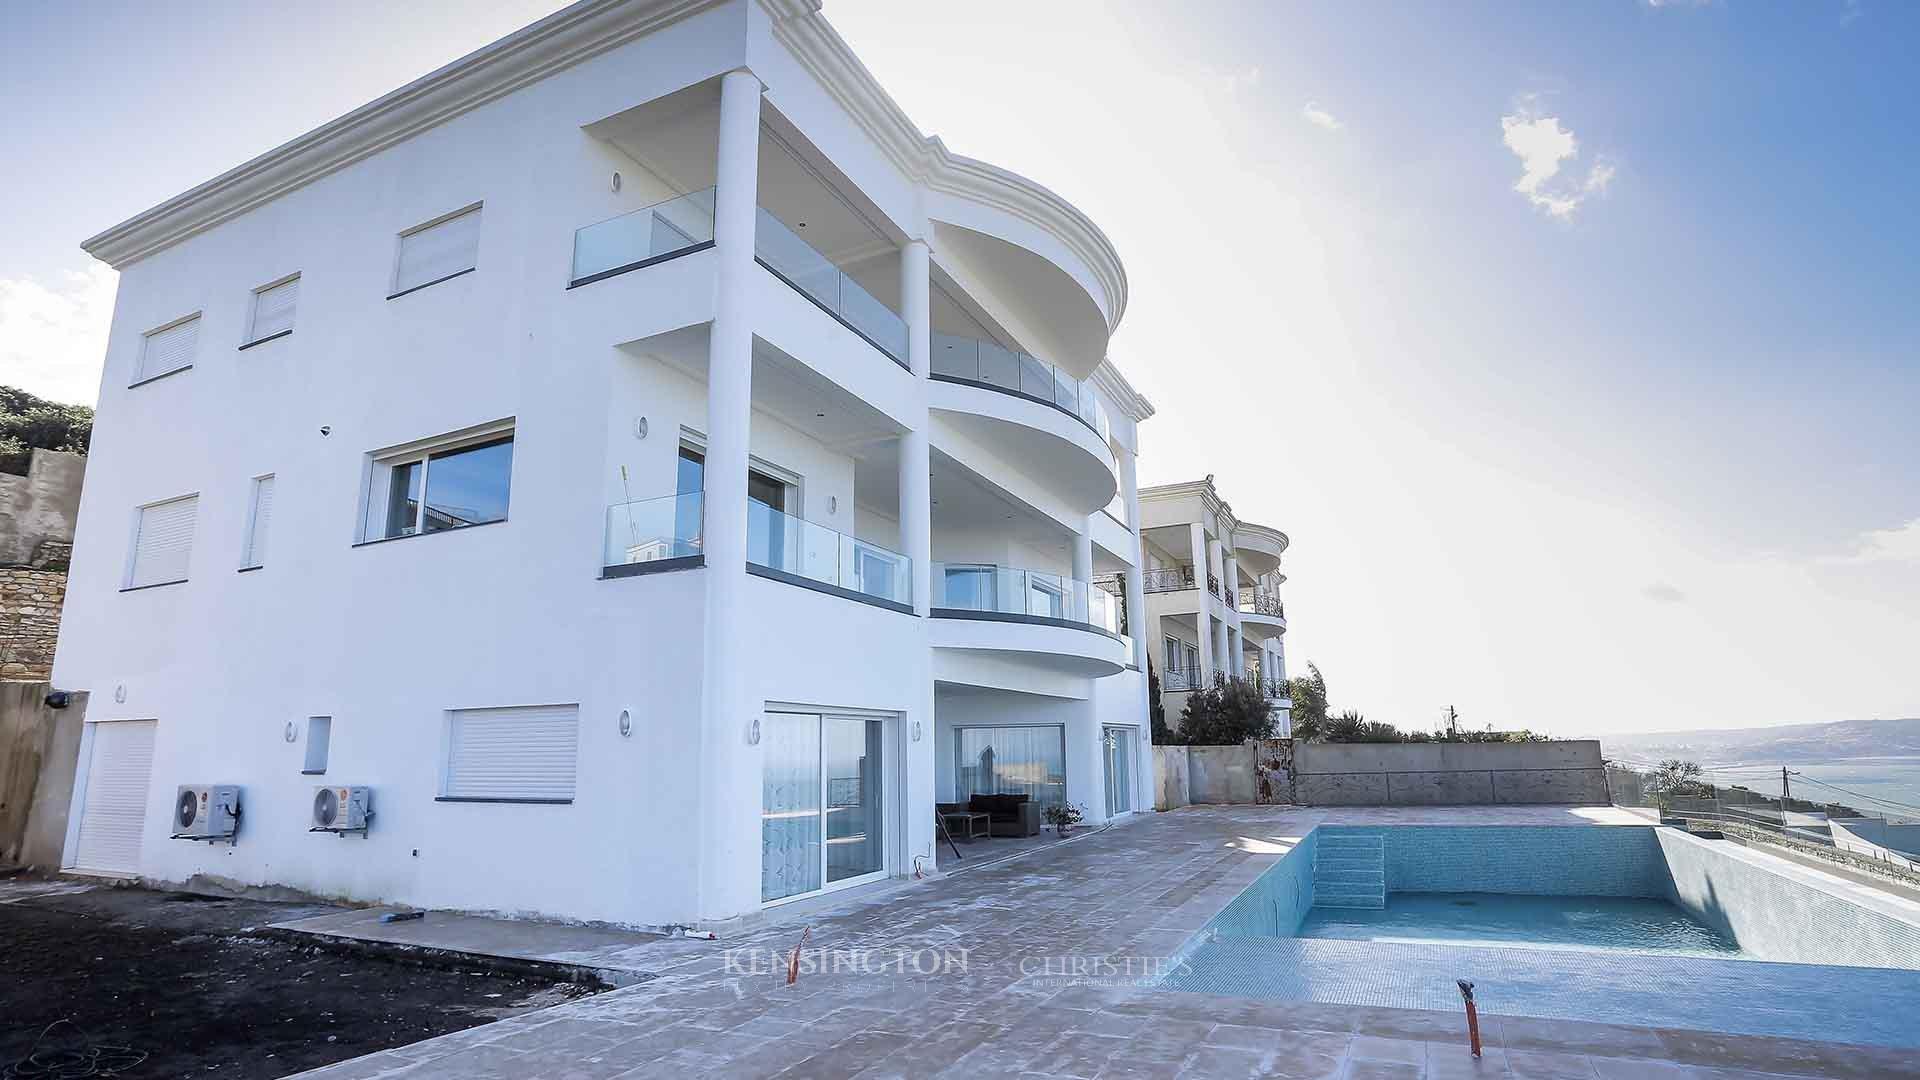 KPPM01186: Villa Azur Luxury Villa Tanger Morocco